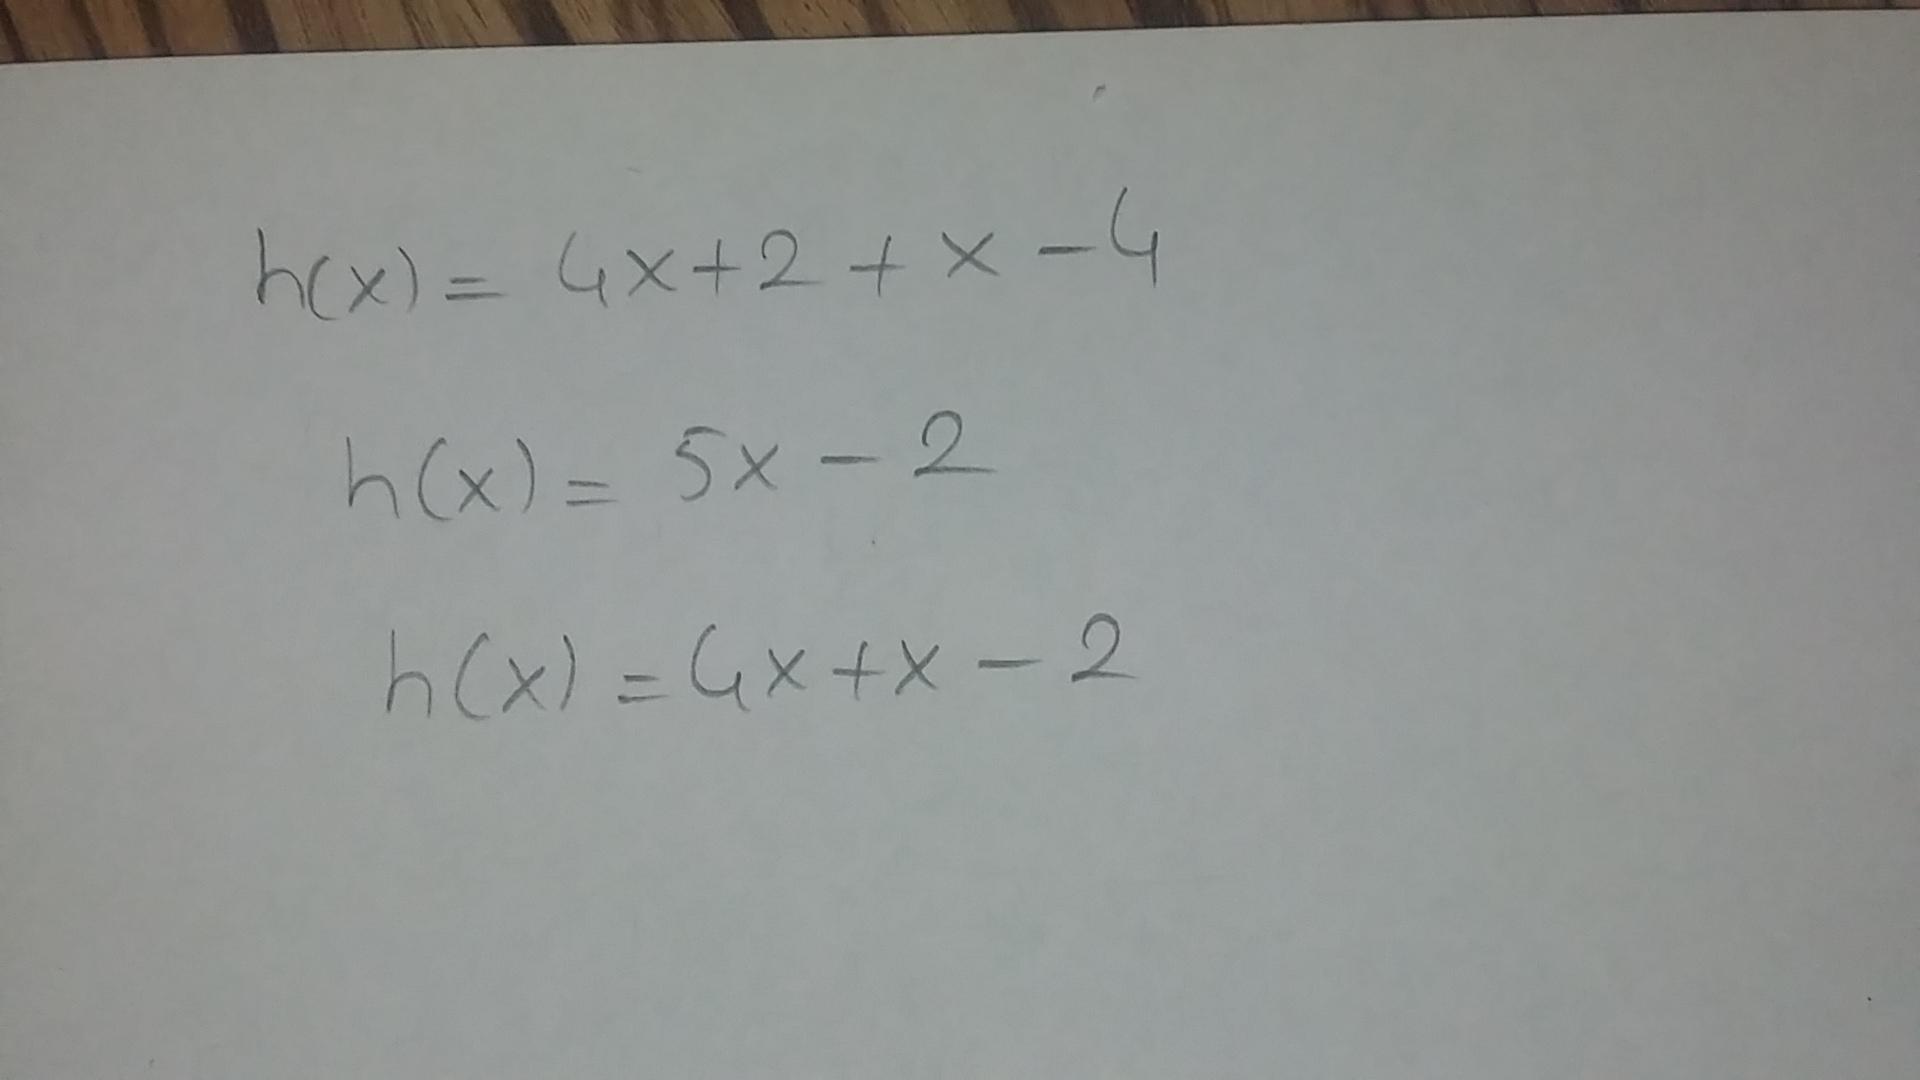 Find The Function H(x) = F(x) + G(x) If F(x) = 4 X + 2 And